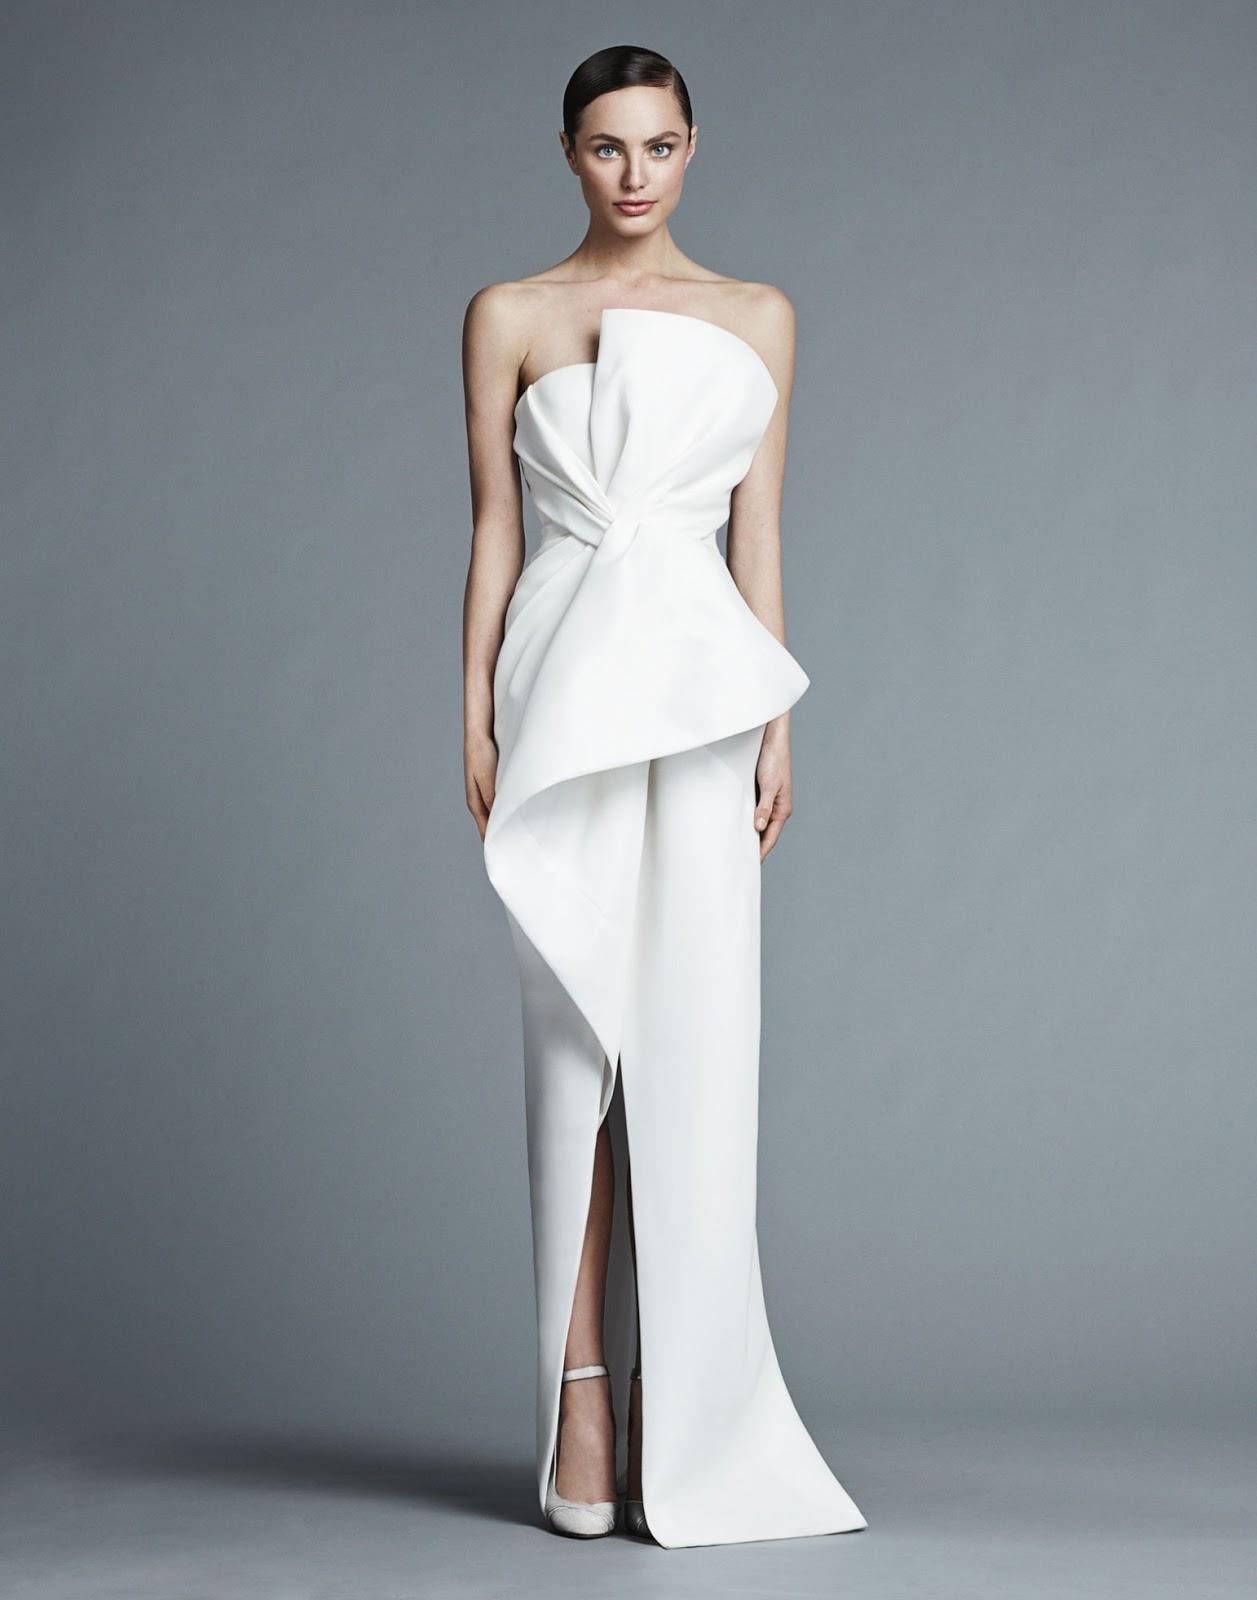 Wedding Dresses Trends for 2015, wedding dresses online, wedding dresses tbbridal